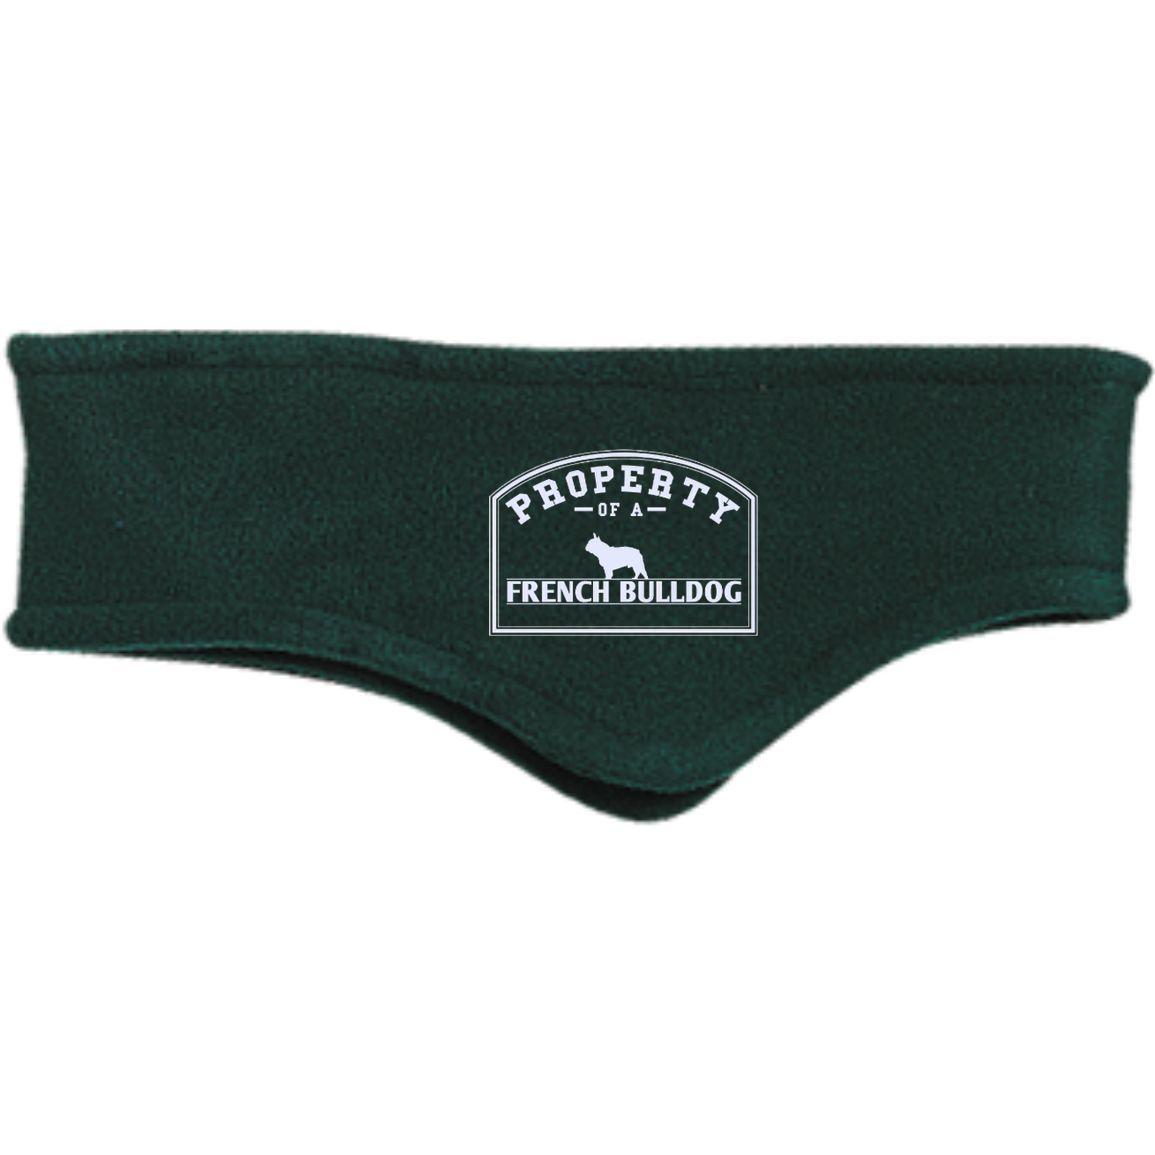 French Bulldog - Property Of A French Bulldog - Fleece Headband